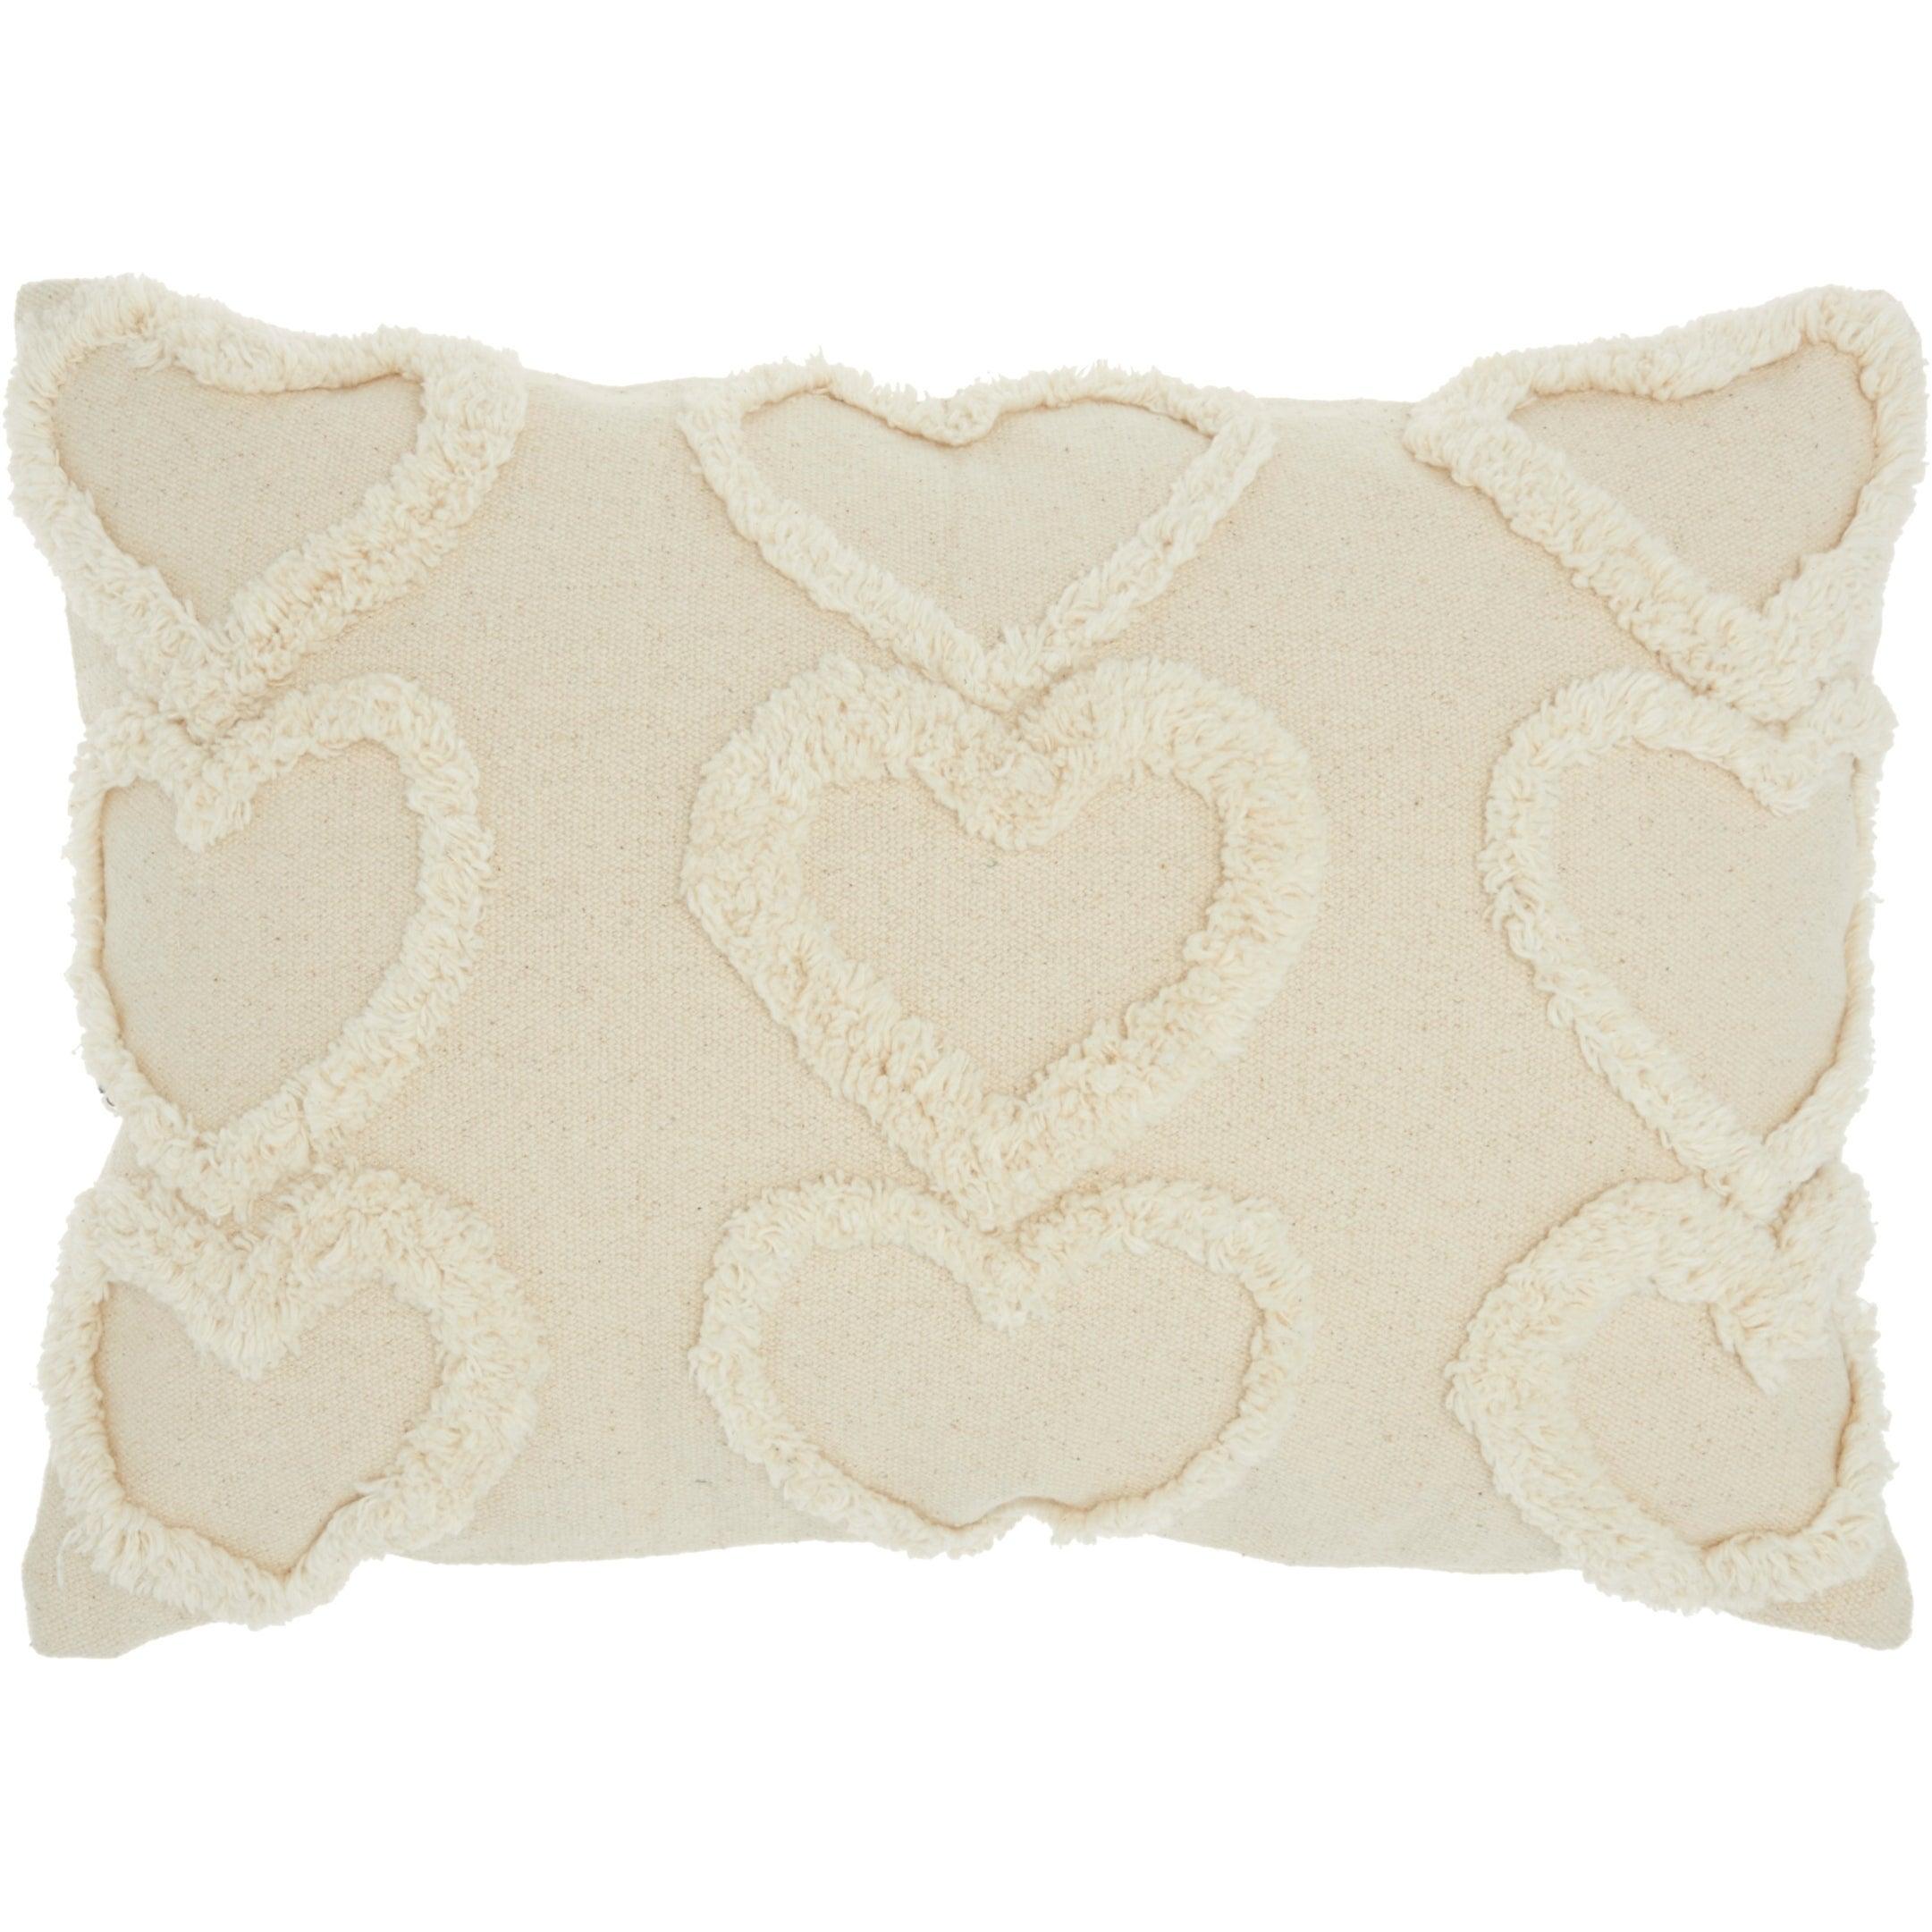 Mina Victory Raised Hearts Throw Pillow 14 X 20 On Sale Overstock 28287778 14 X 20 Khaki